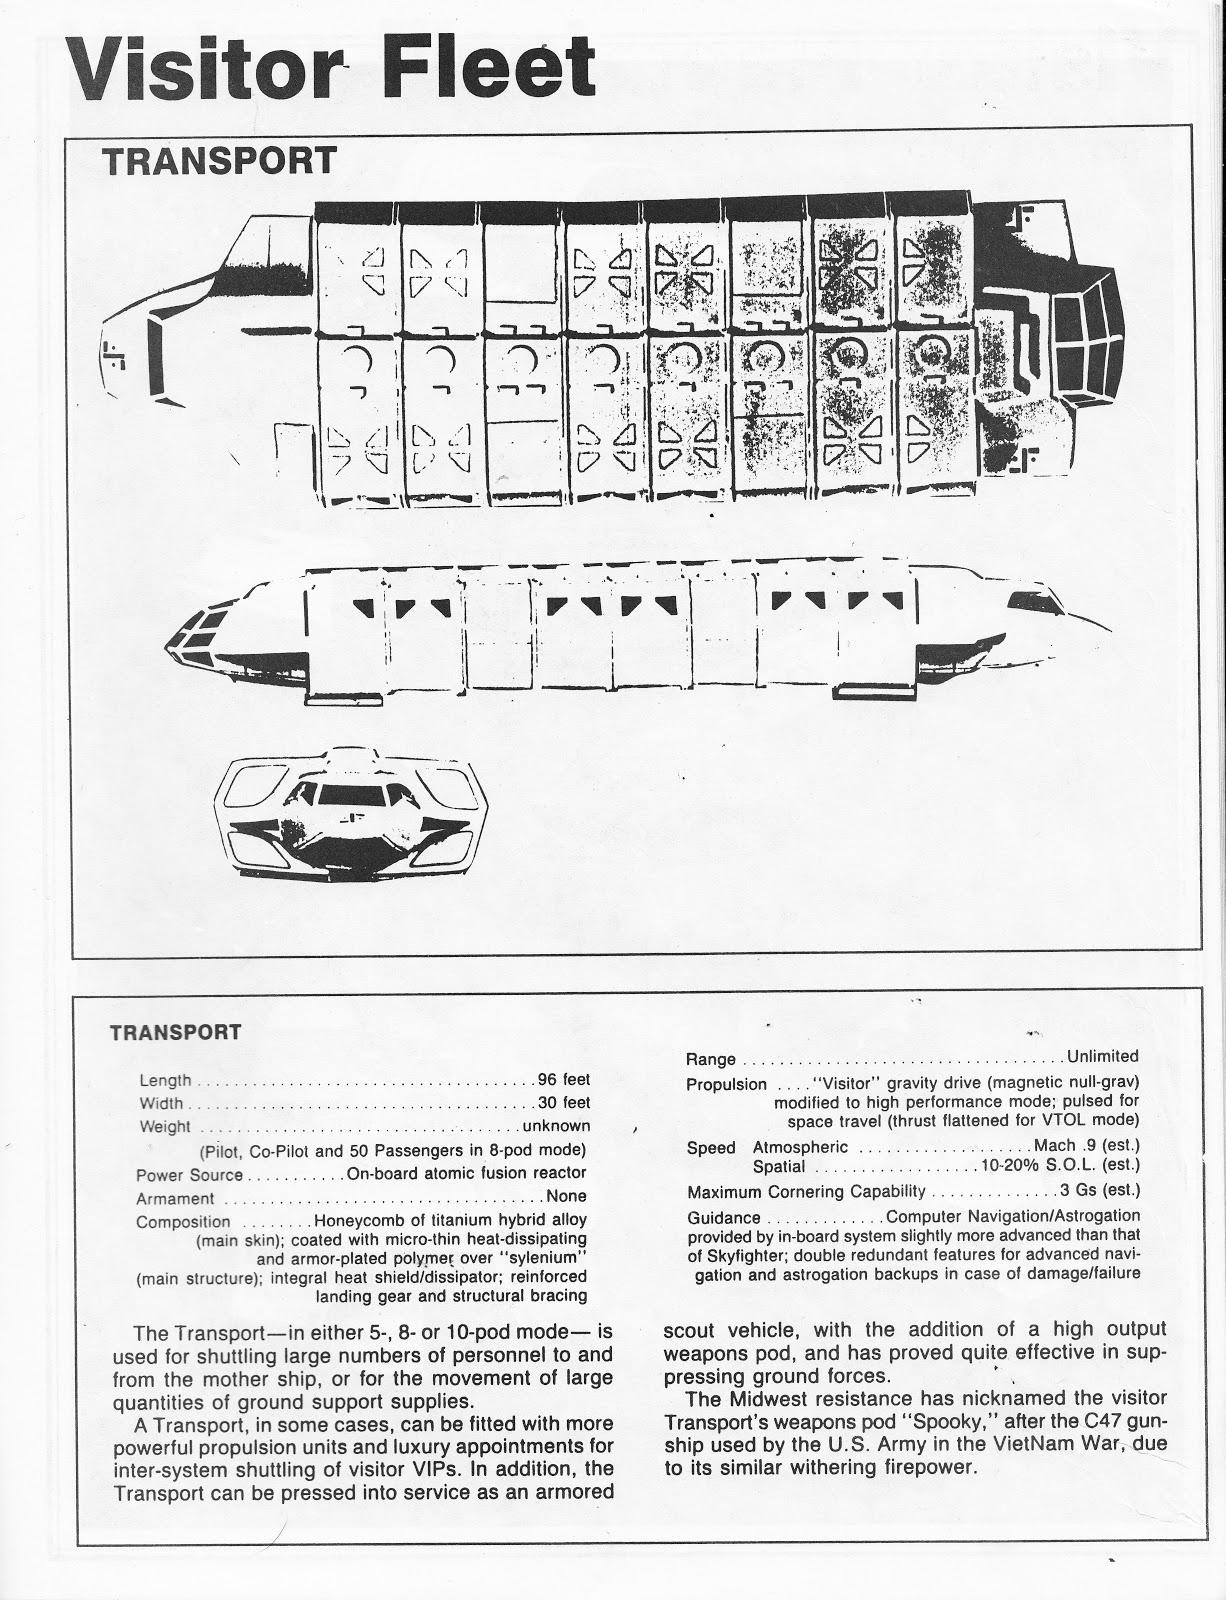 starlogged geek media again 1985 v the visitor technical rh starlogged blogspot com Army Technical Manuals Technical Manual Clip Art